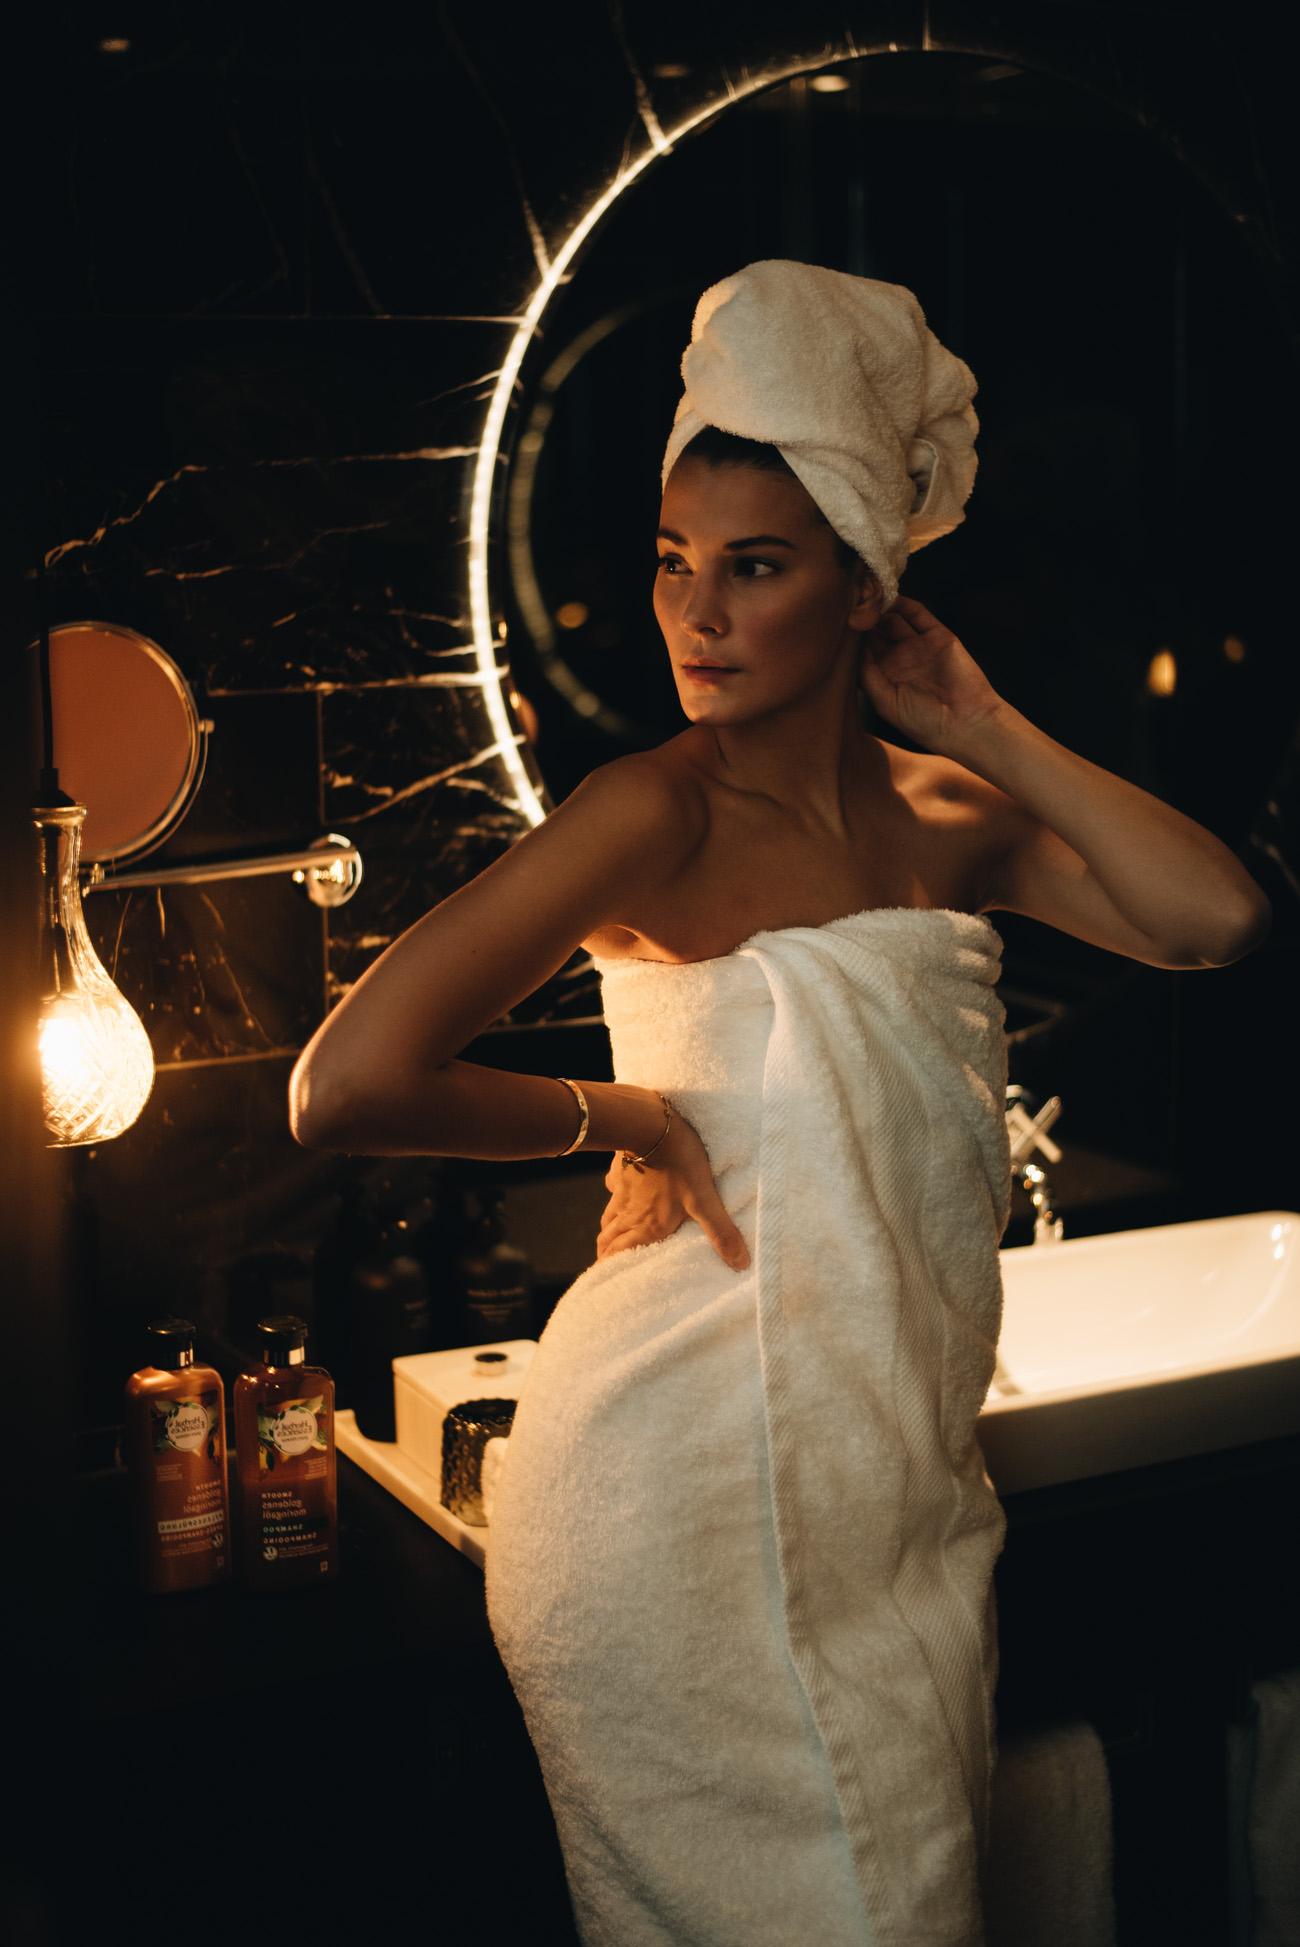 beauty-shooting-editorial-badezimmer-roomers-hotel-münchen-fashiioncarpet-nina-schwichtenberg